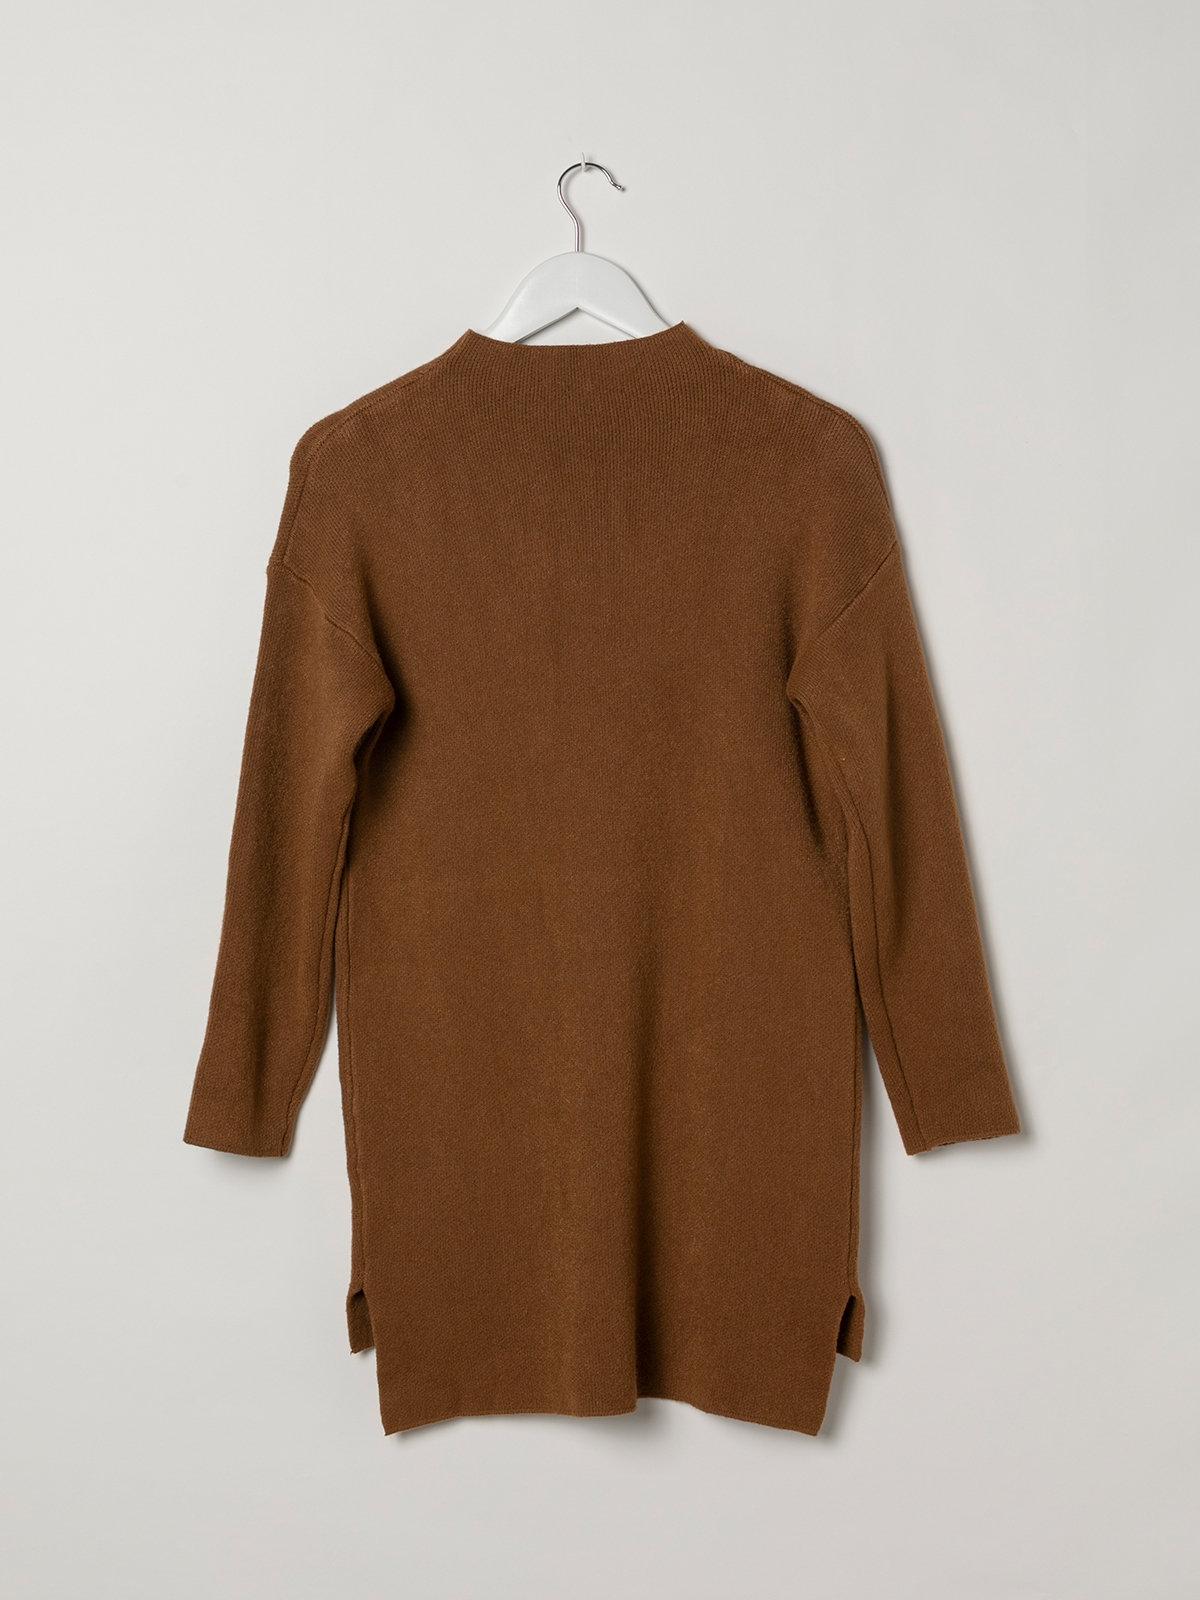 Woman Soft knit dress sweater Camel